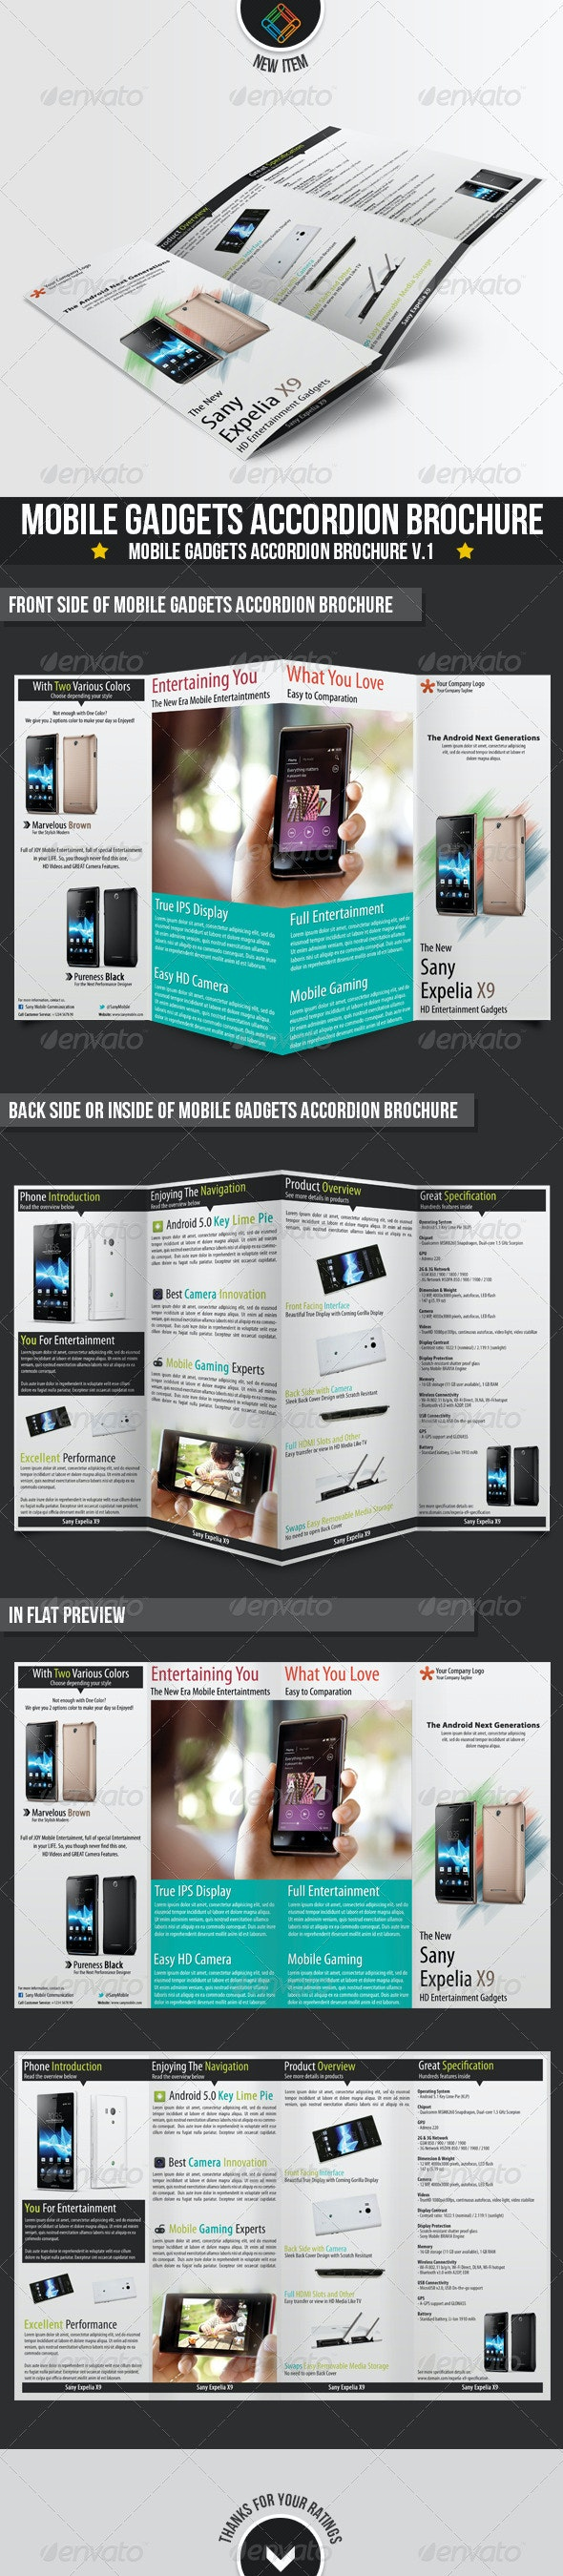 Modern Mobile Gadgets Accordion Brochures - Brochures Print Templates